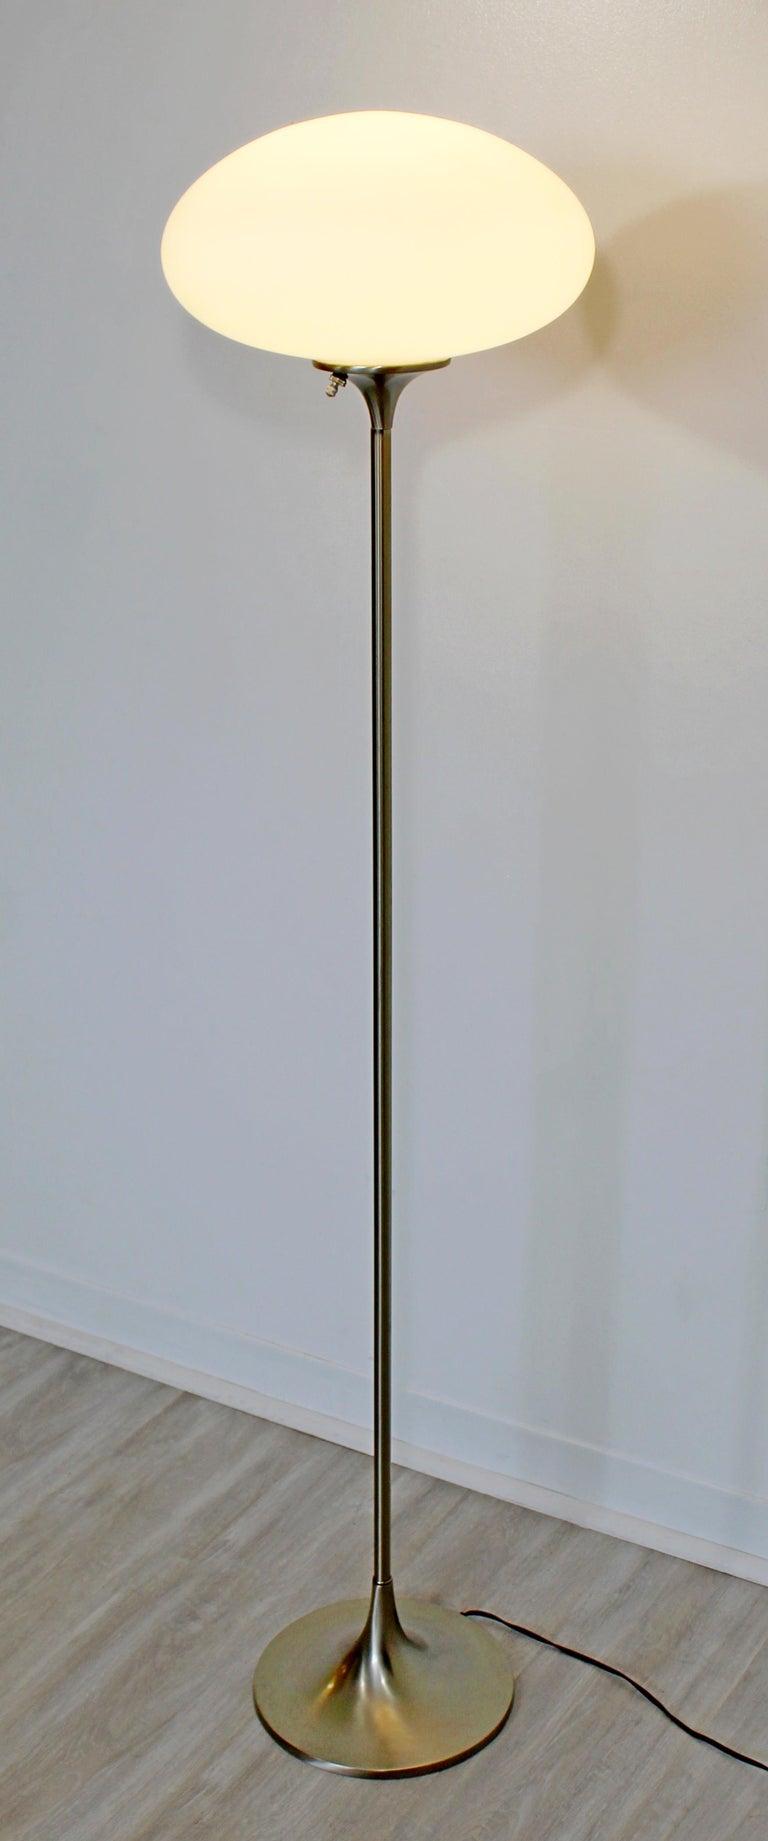 American Mid-Century Modern Brushed Steel Glass Mushroom Standing Floor Lamp Laurel 1970s For Sale